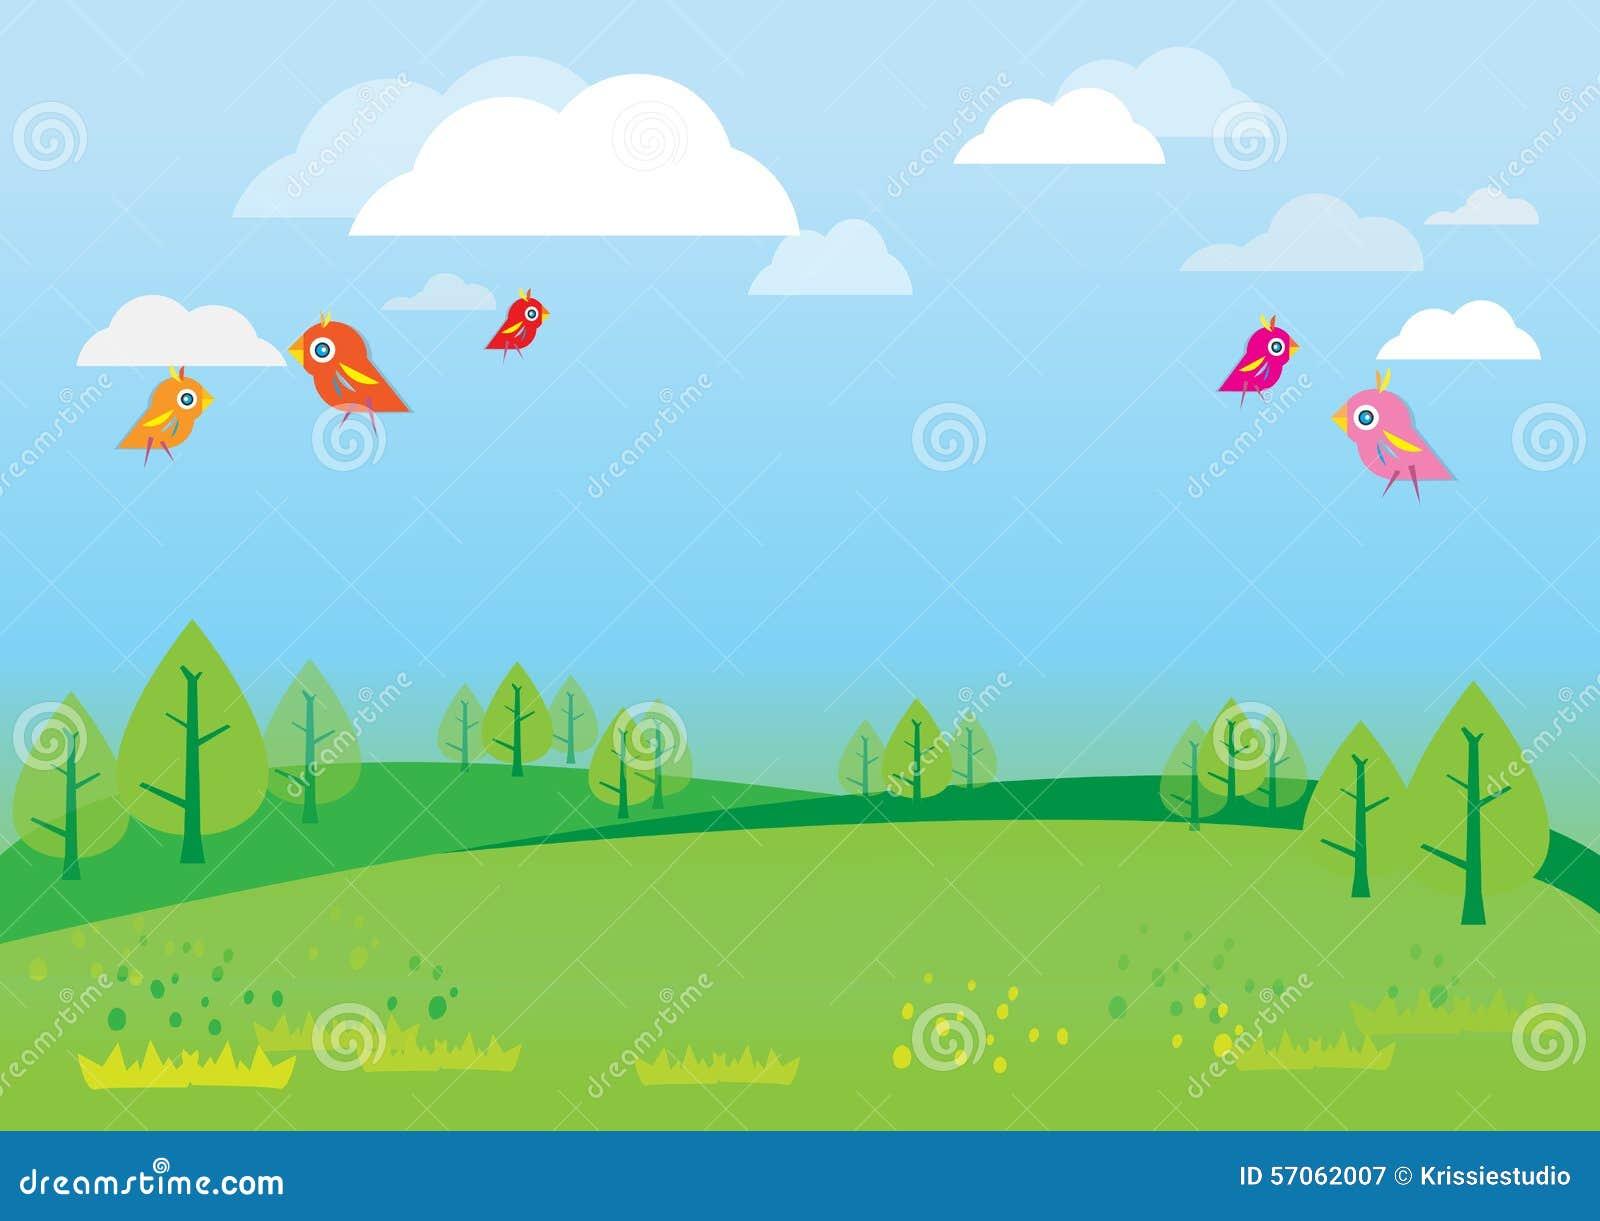 Natural Background For Kids Vector